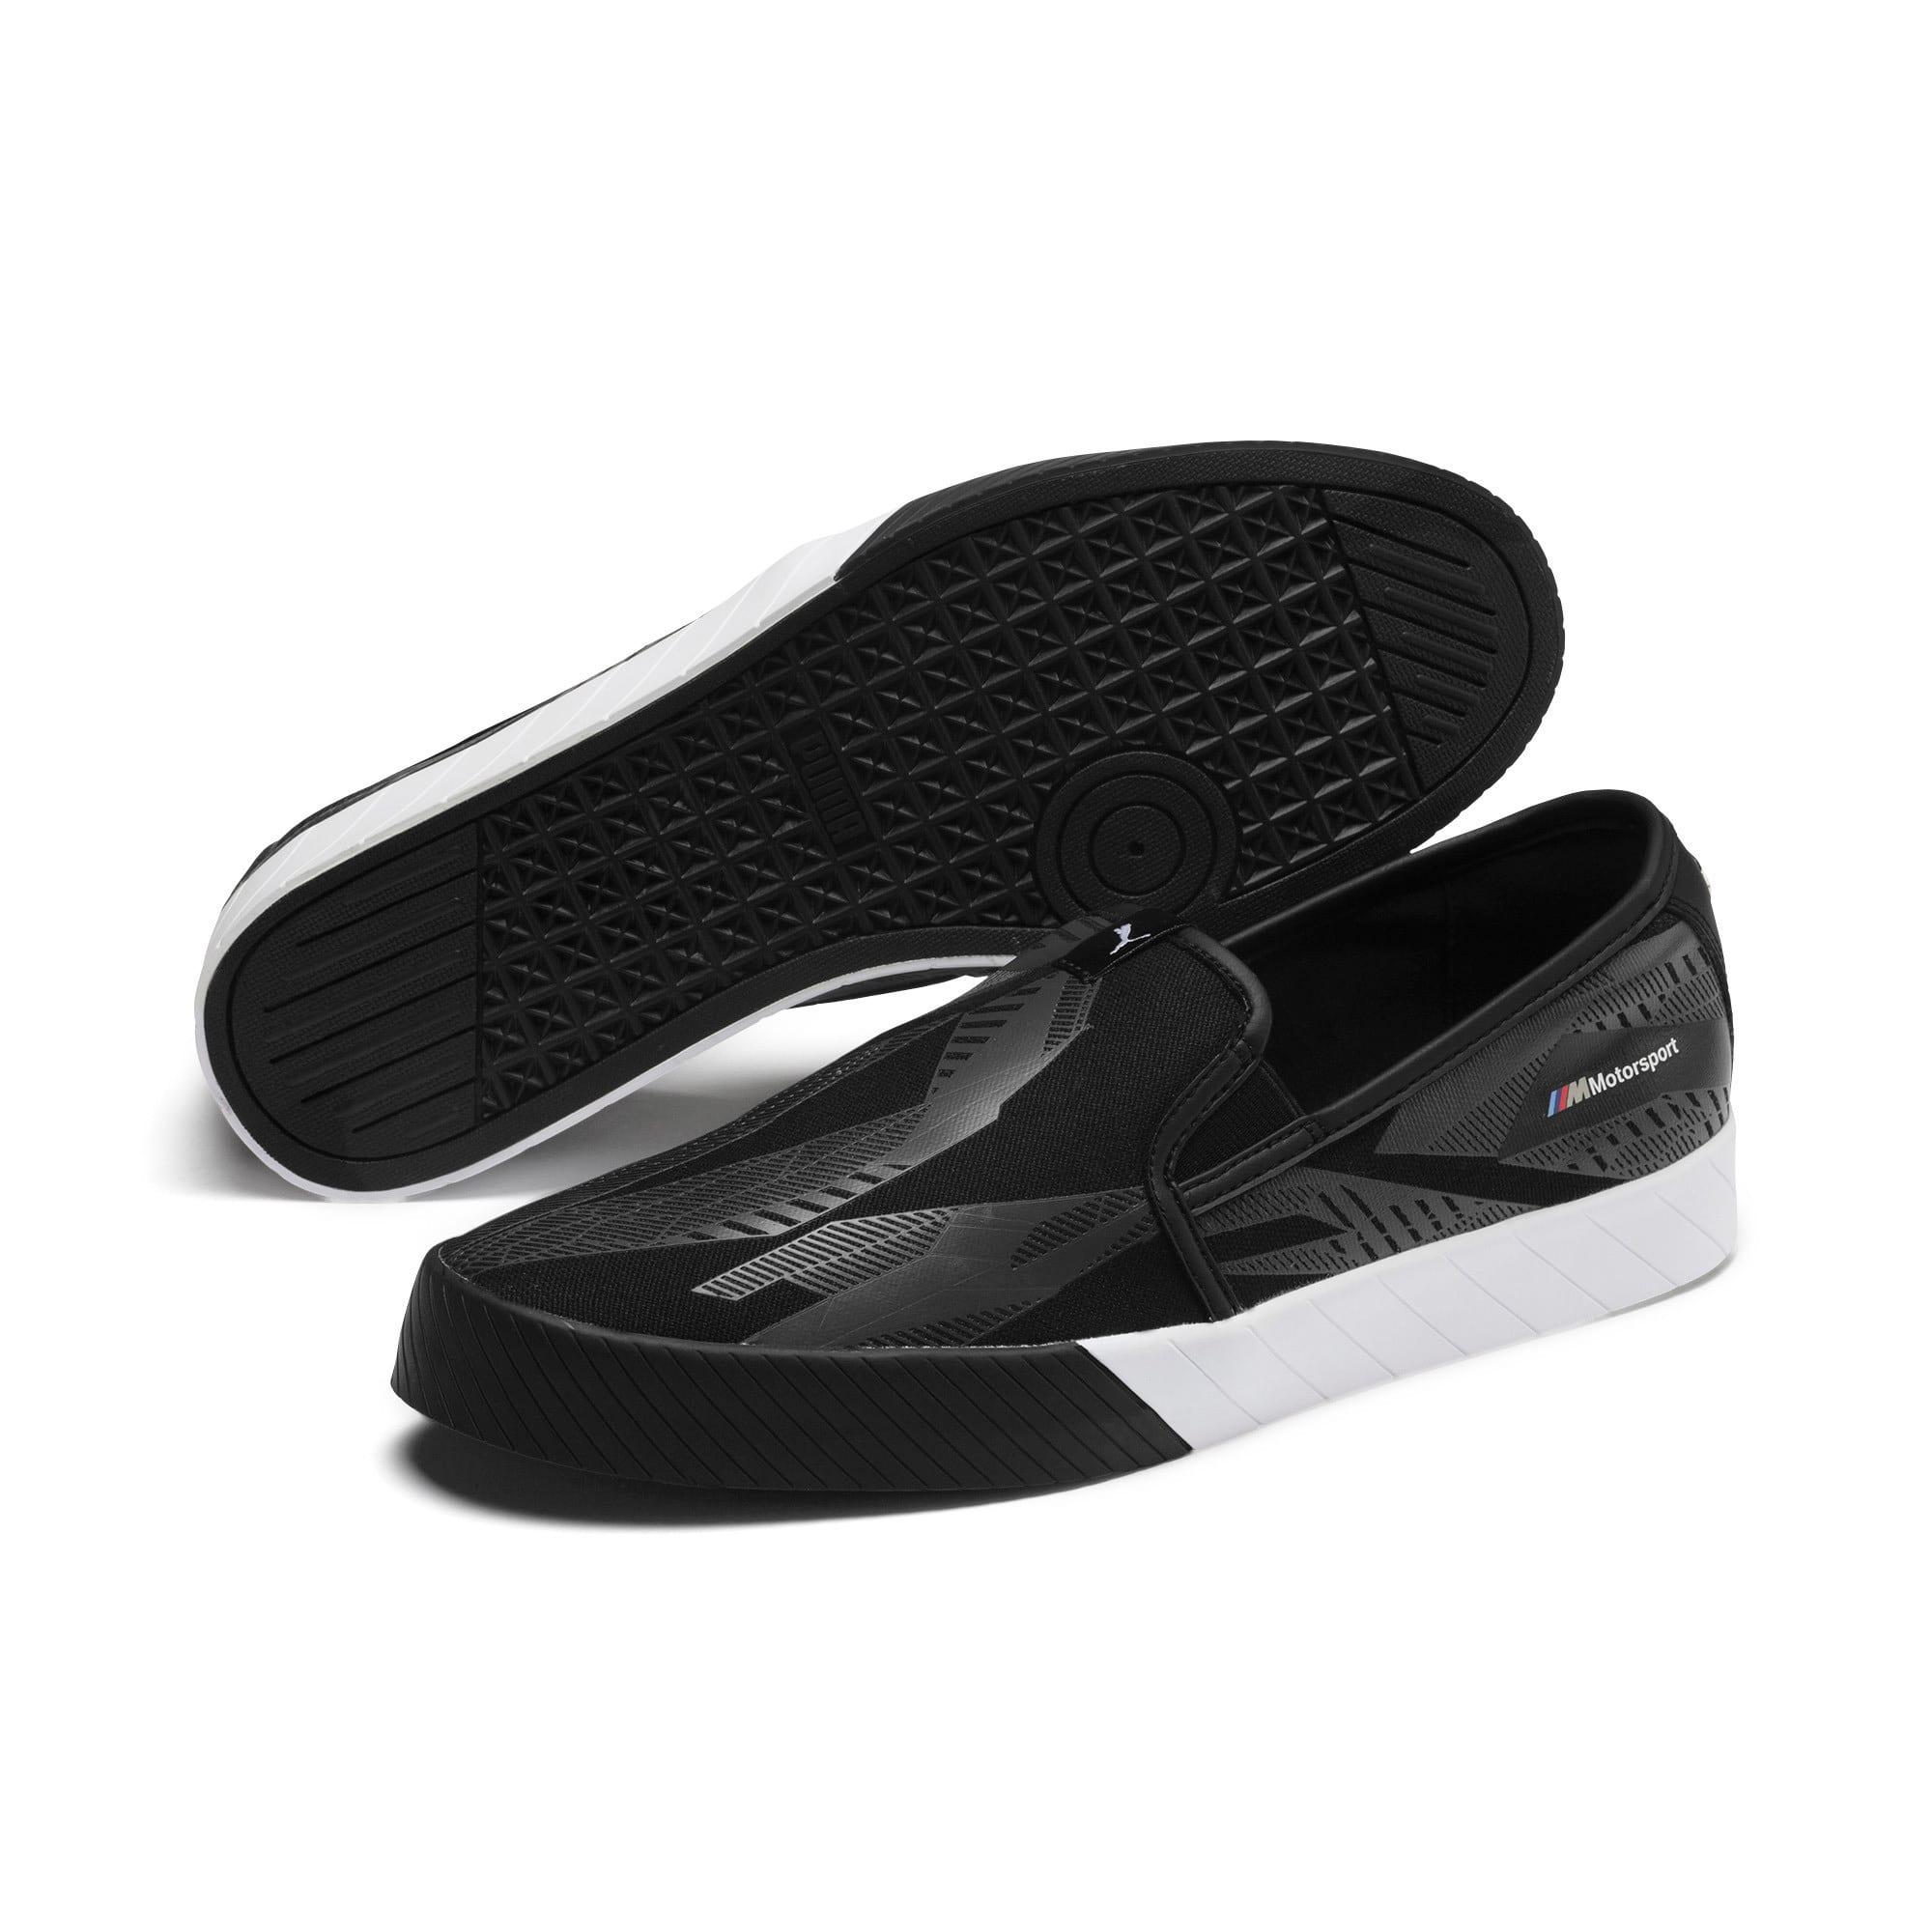 Thumbnail 4 of BMW M Slip-On Track Shoes, Puma Black-Puma Black, medium-IND